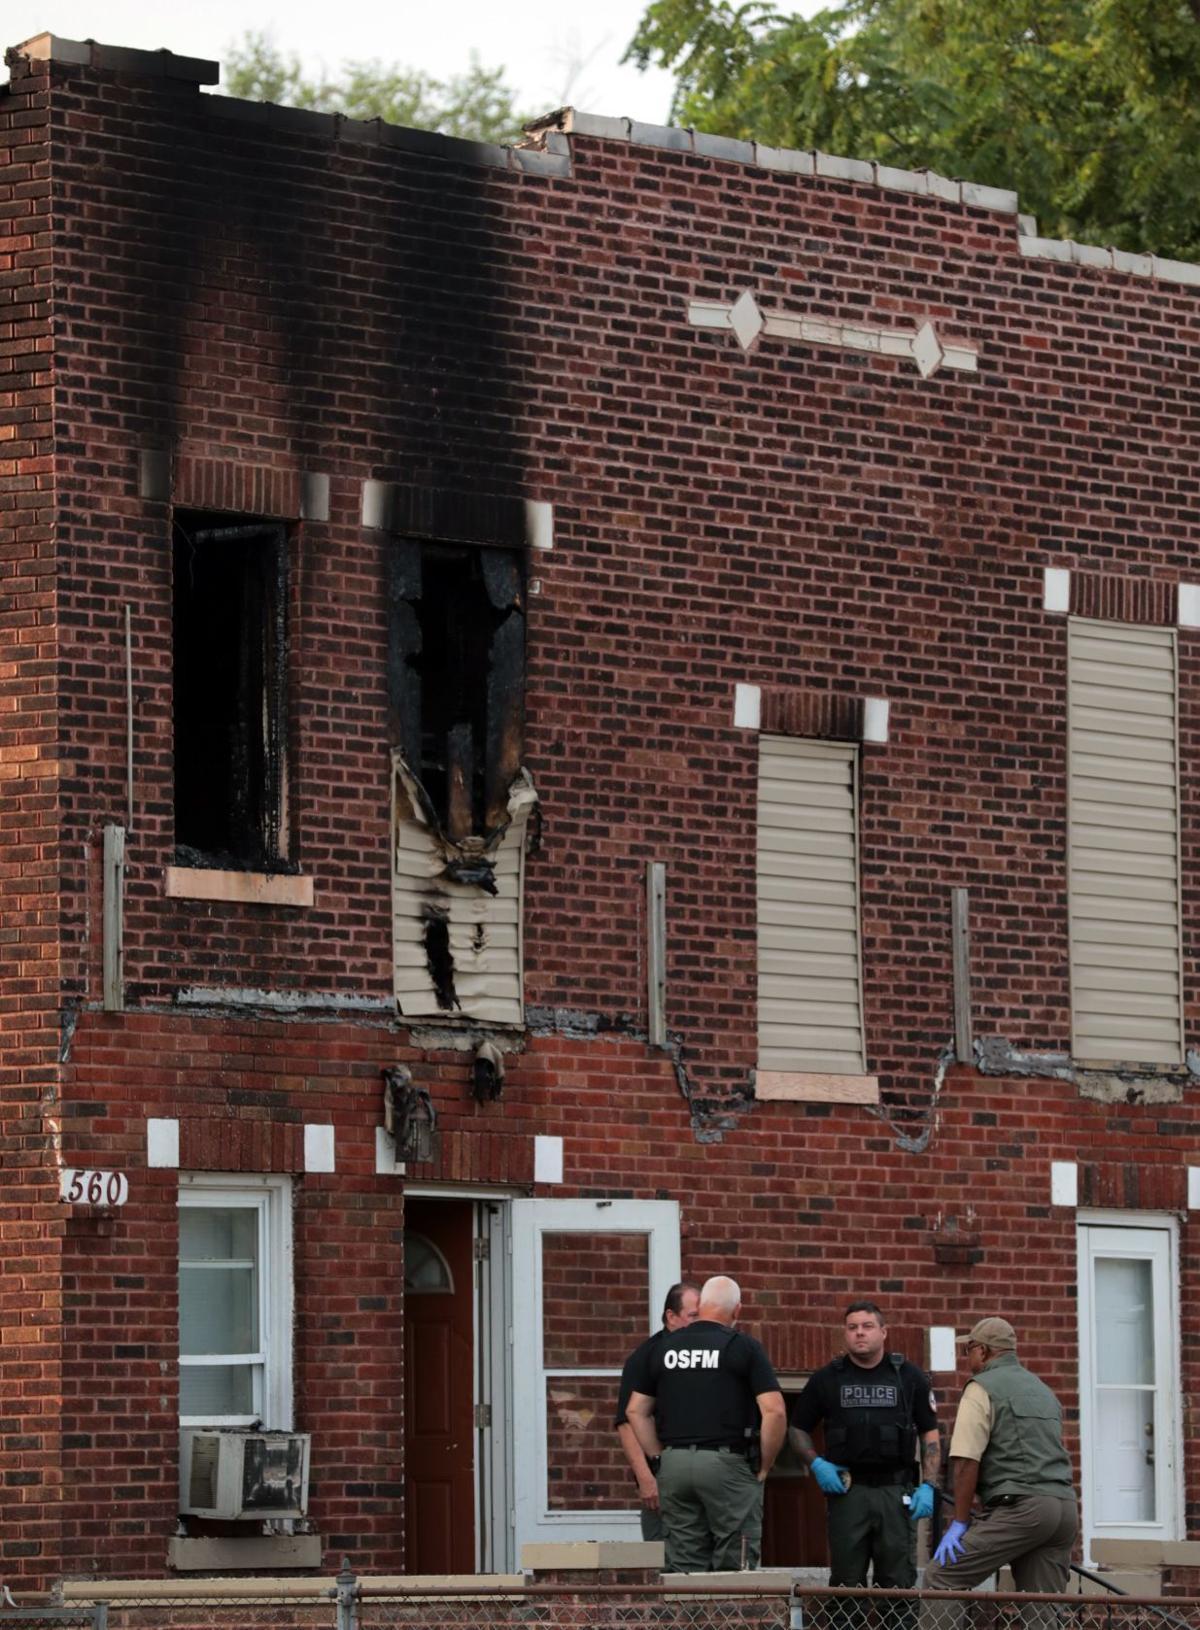 East St. Louis fire kills 5 children